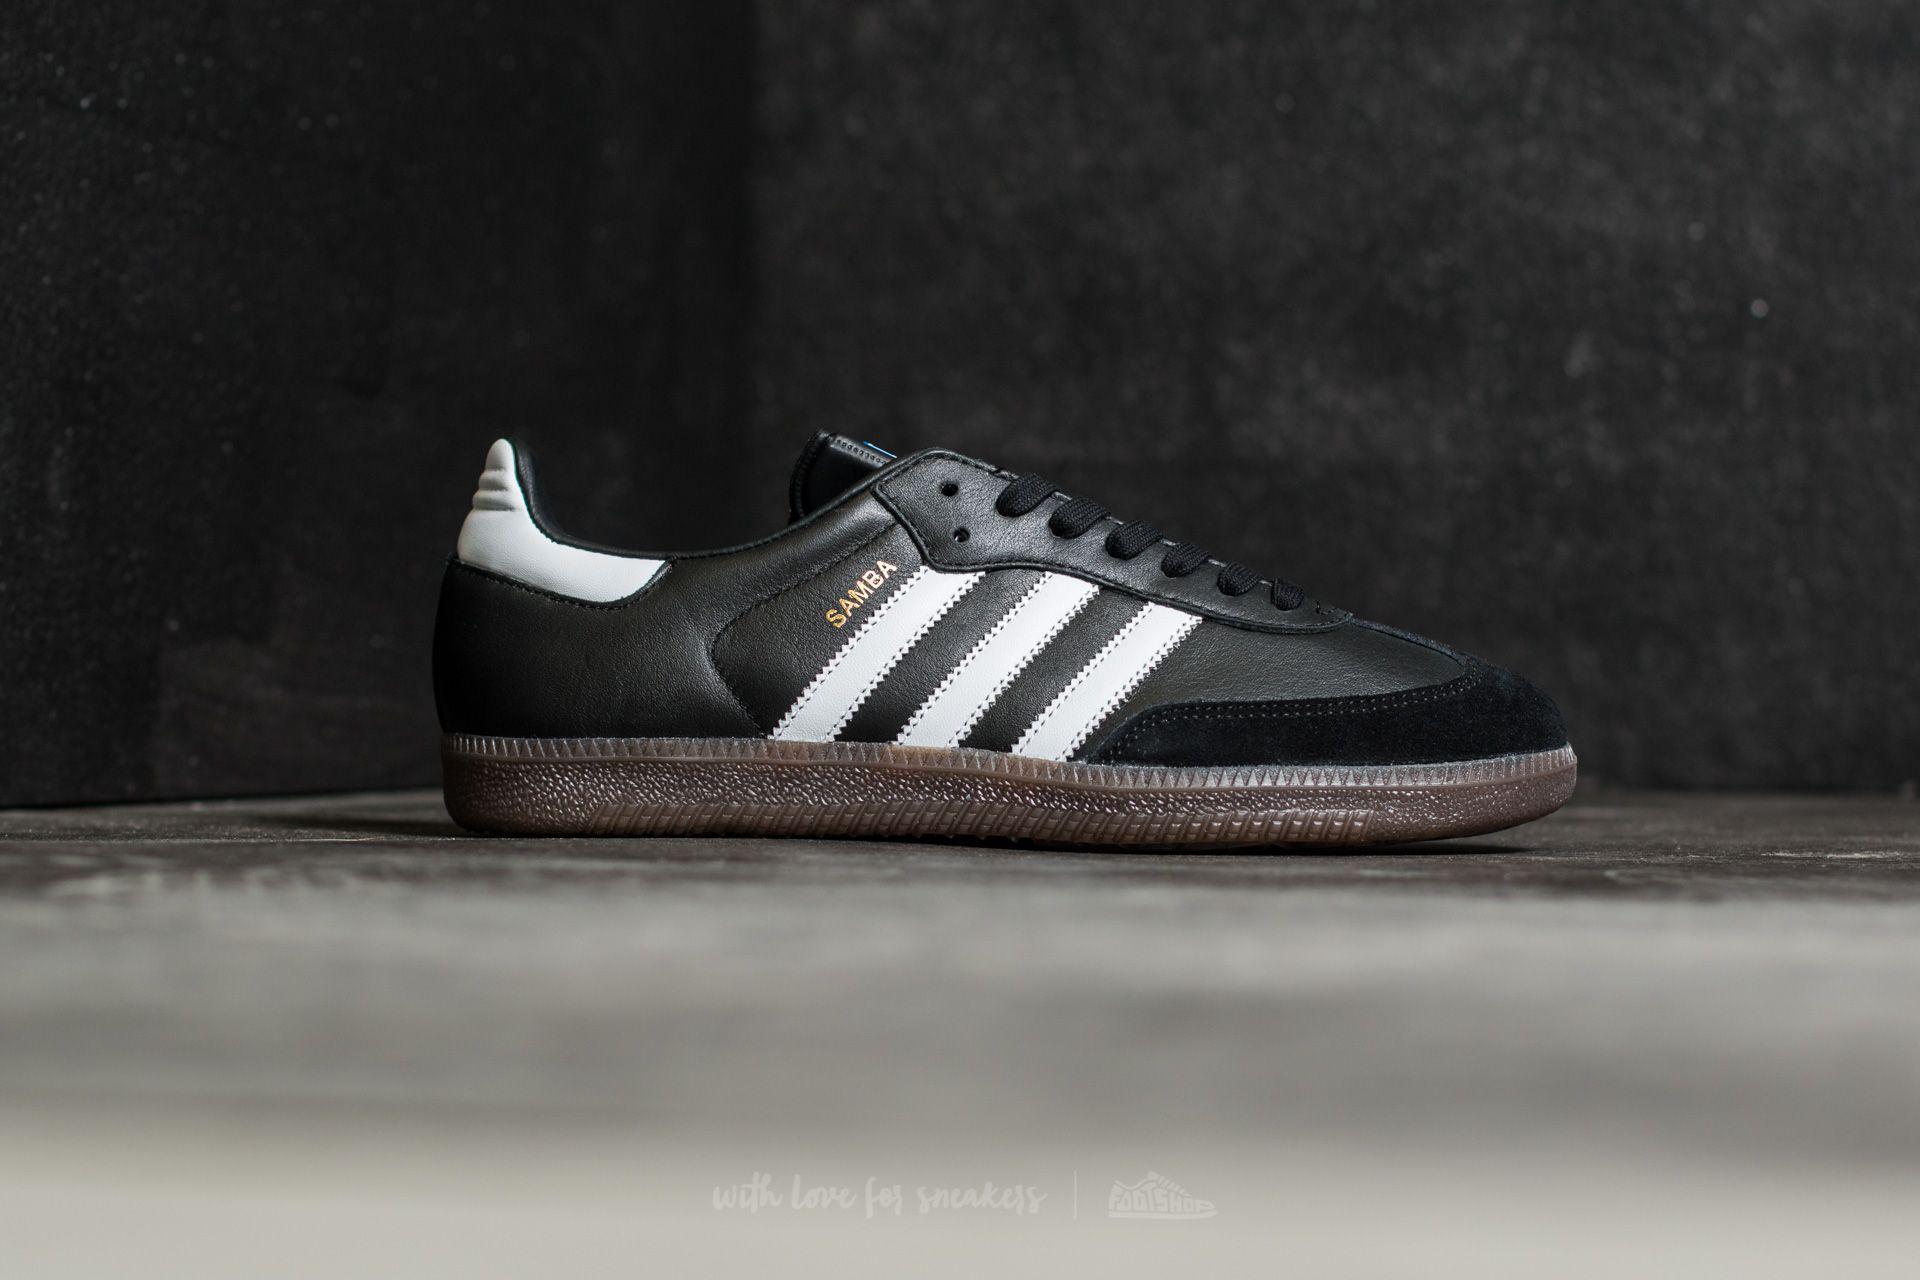 adidas Adidas Samba W Core Black/ Ftw White/ Gum 5 5duUv